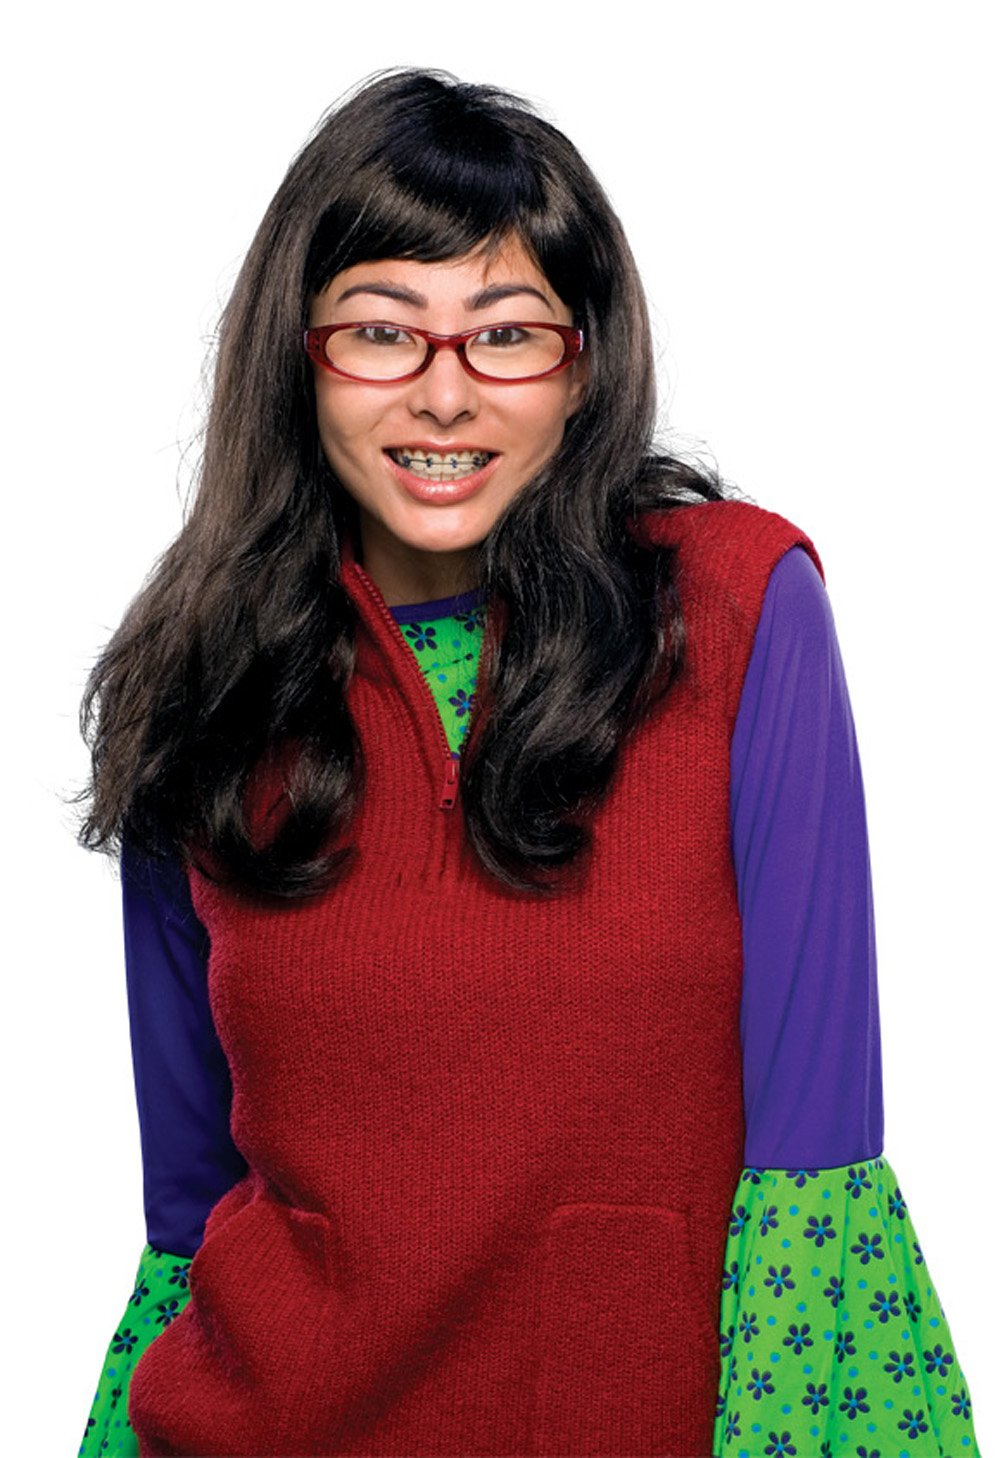 51670 Ugly Betty Wig, Glasses & Fake Braces Teeth